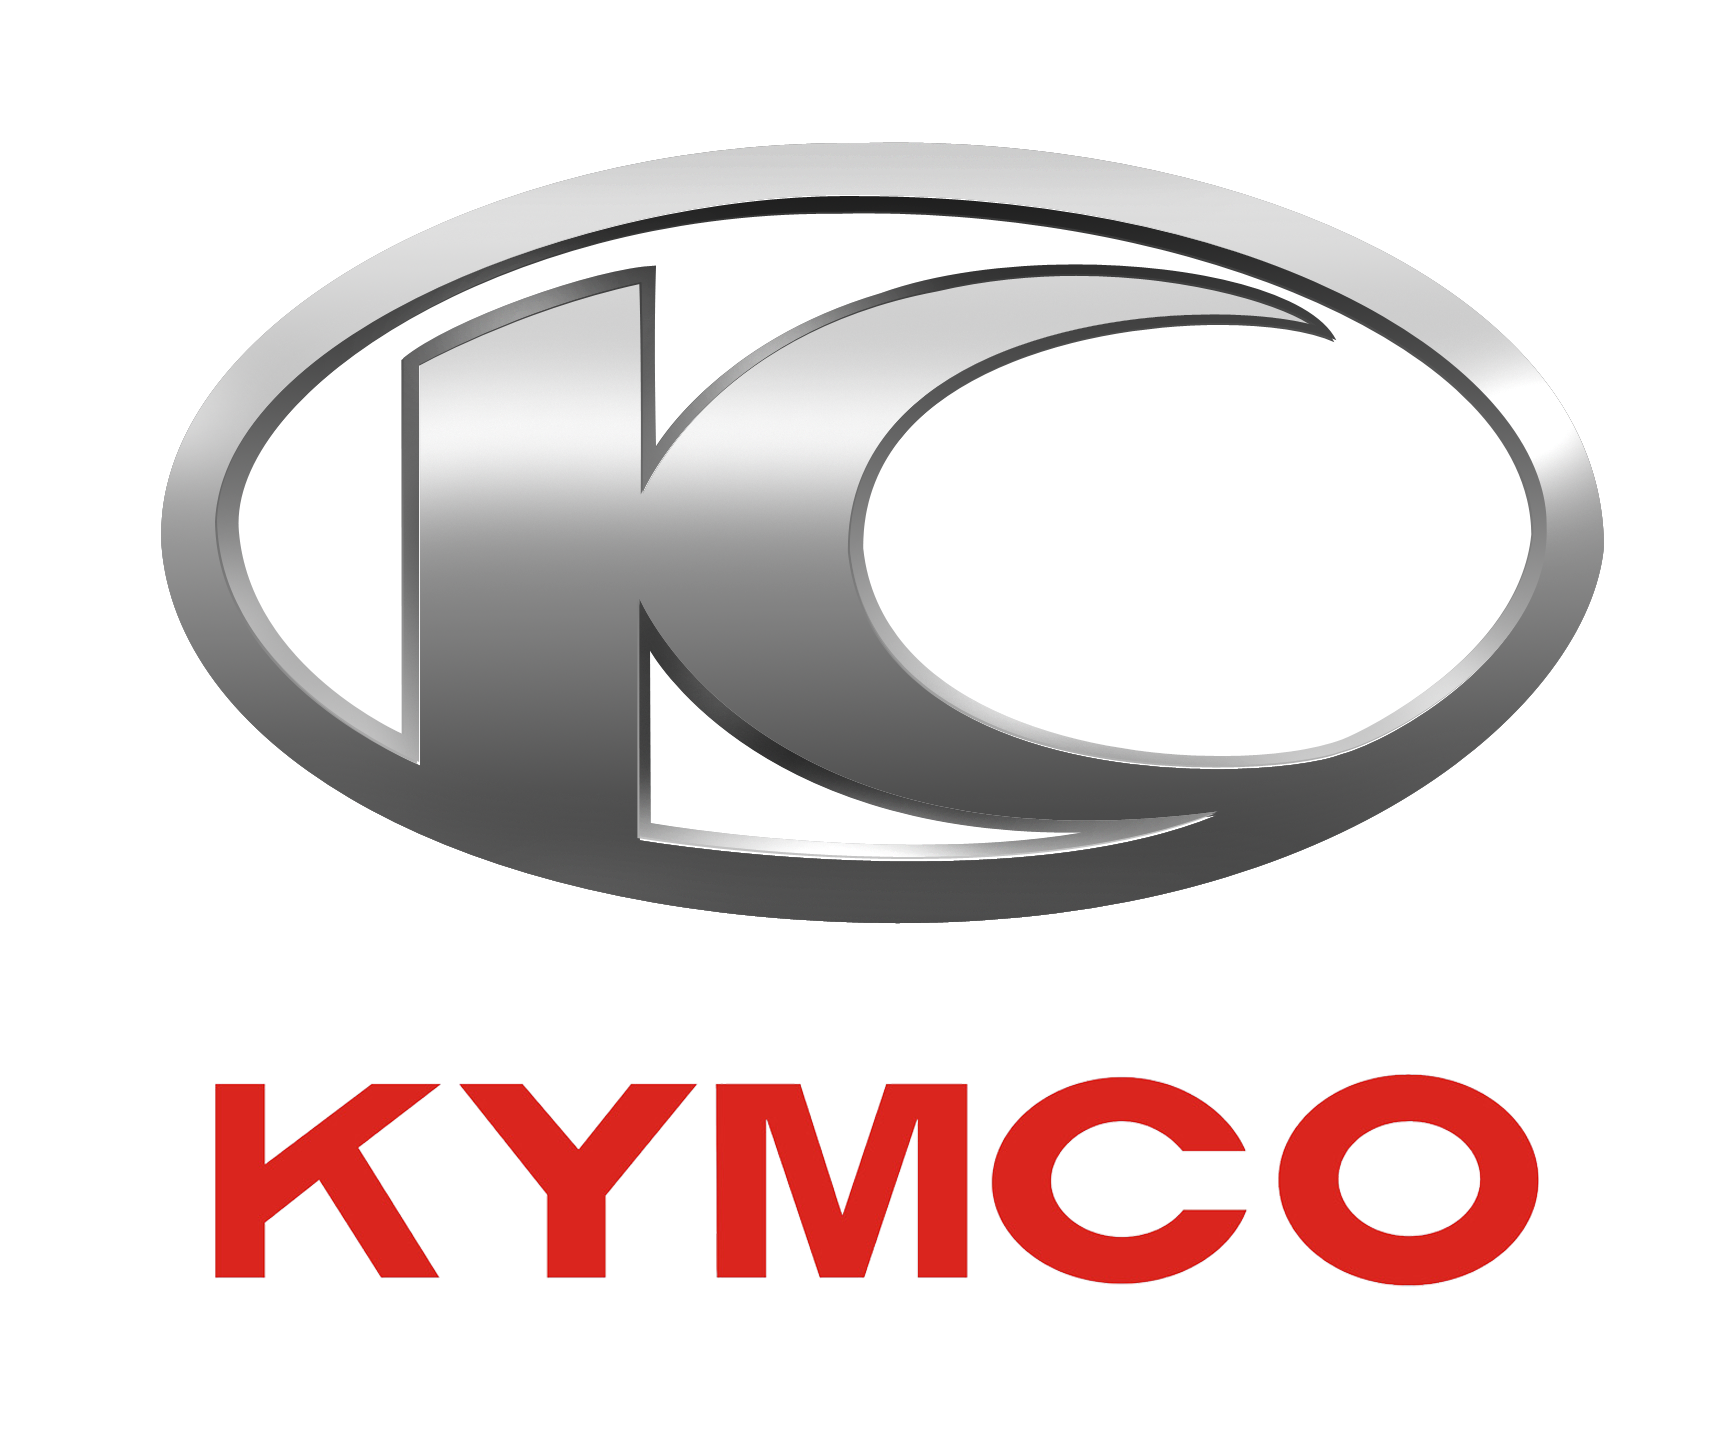 Kymco logo vierkant - Vuijk Scooters